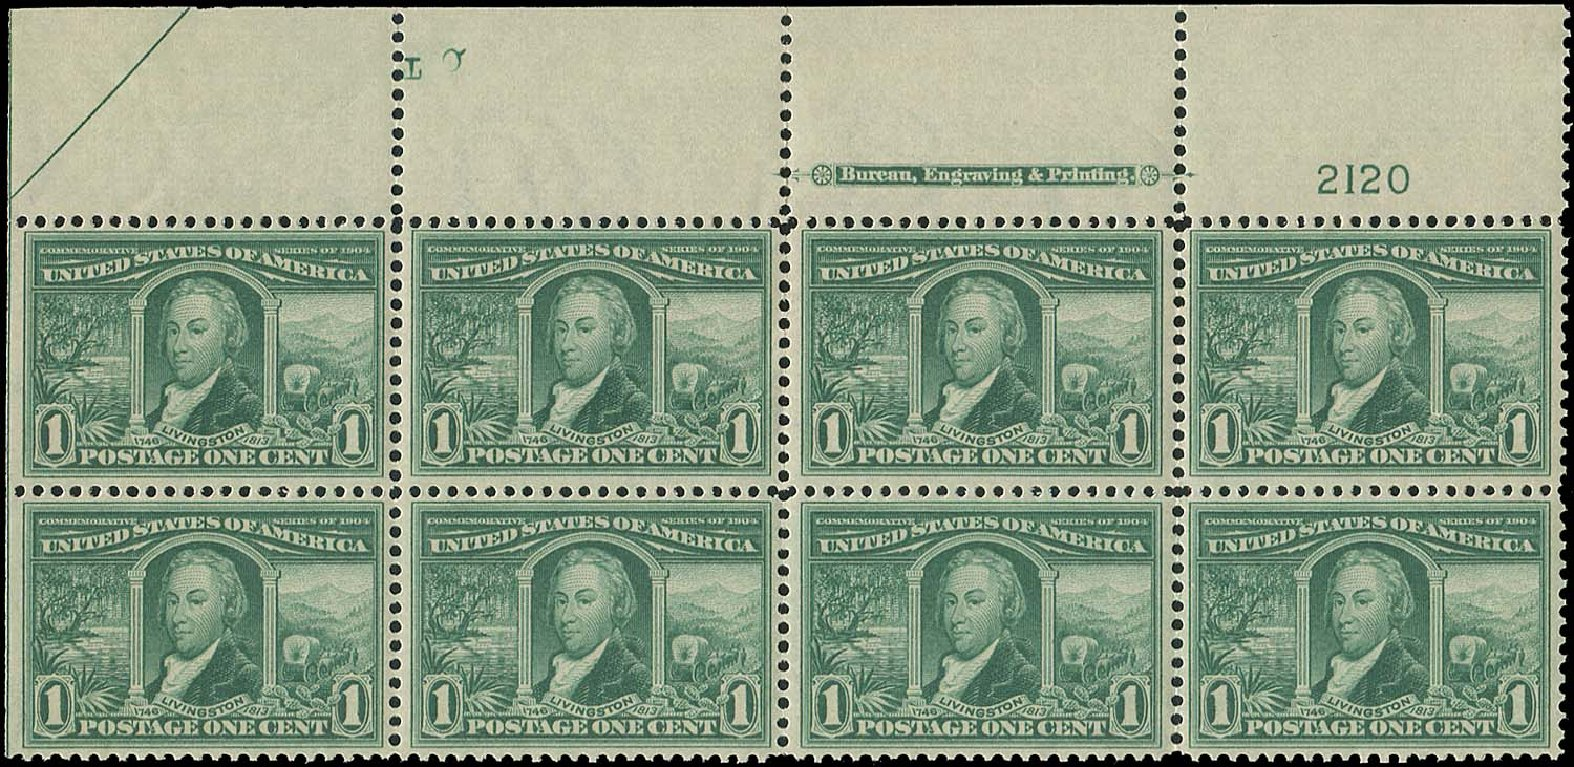 US Stamp Values Scott #323: 1904 1c Louisiana Purchase Exposition. Regency-Superior, Aug 2015, Sale 112, Lot 1314